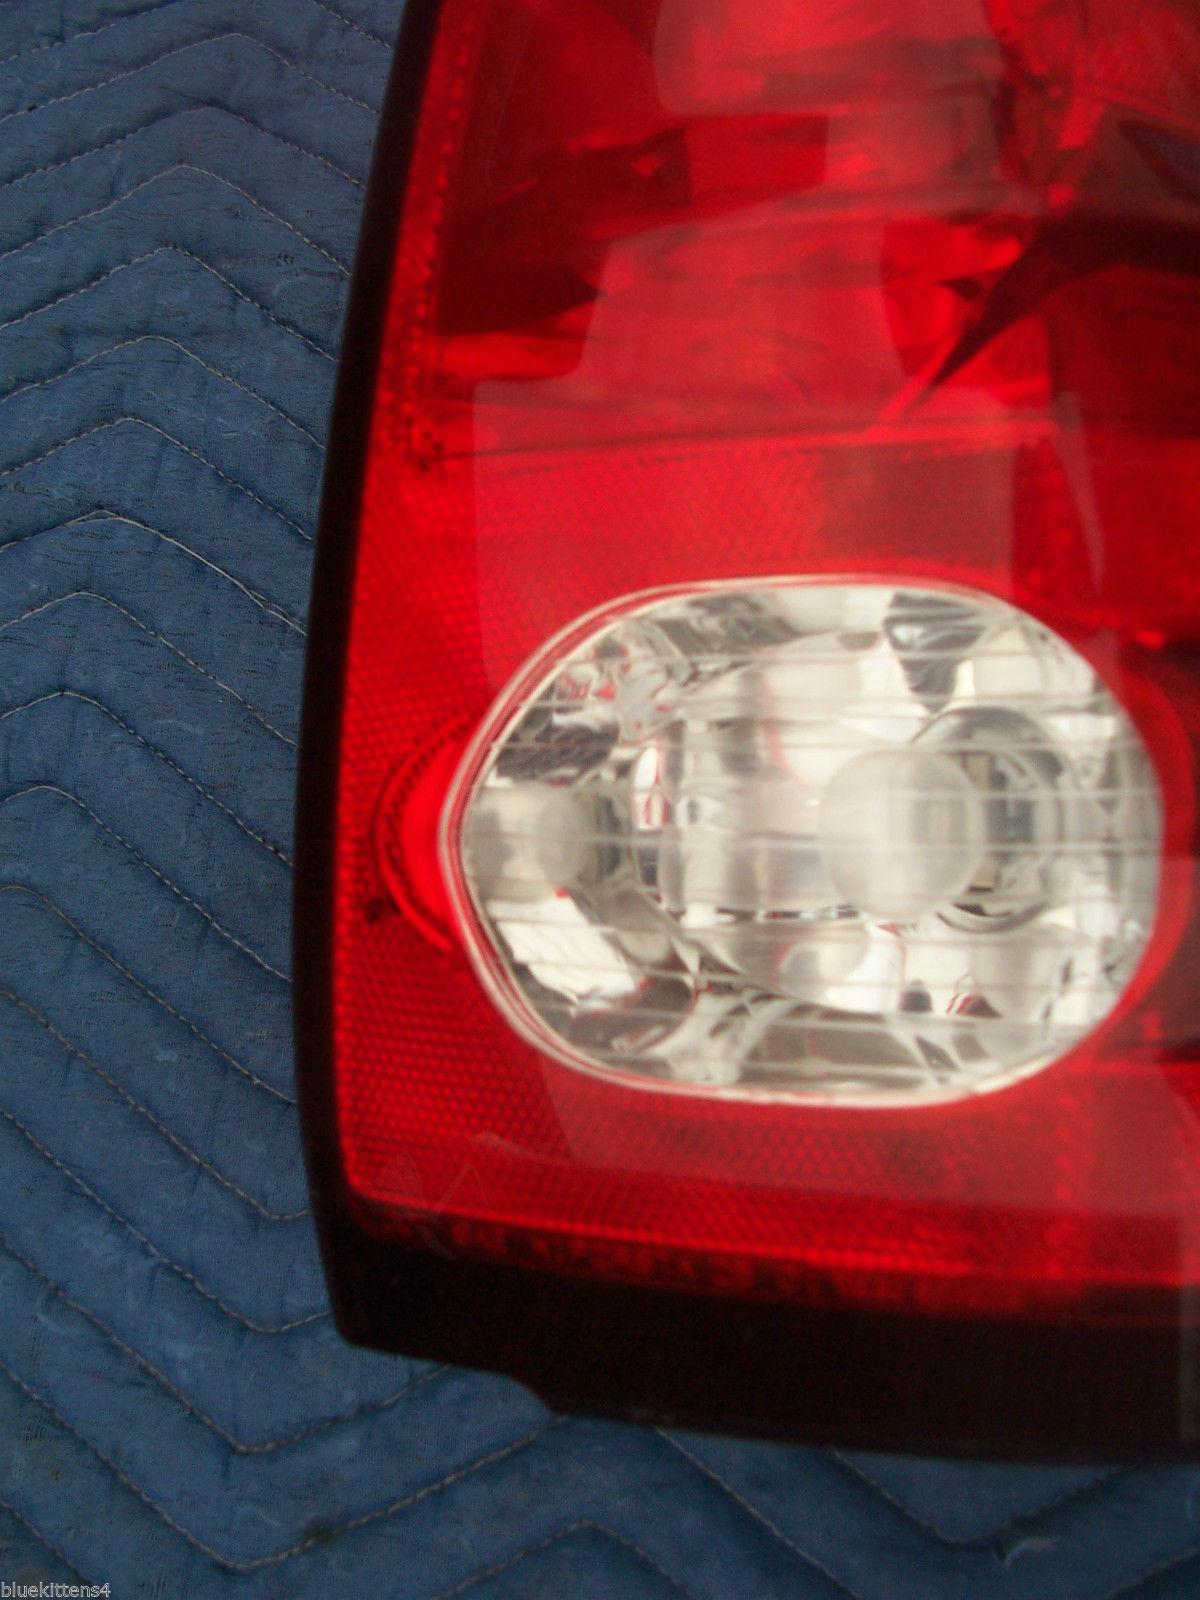 2001 AZTEC RIGHT TAILLIGHT OEM USED ORIGINAL PONTIAC GM PART 2002 2003 2004 2005 image 2